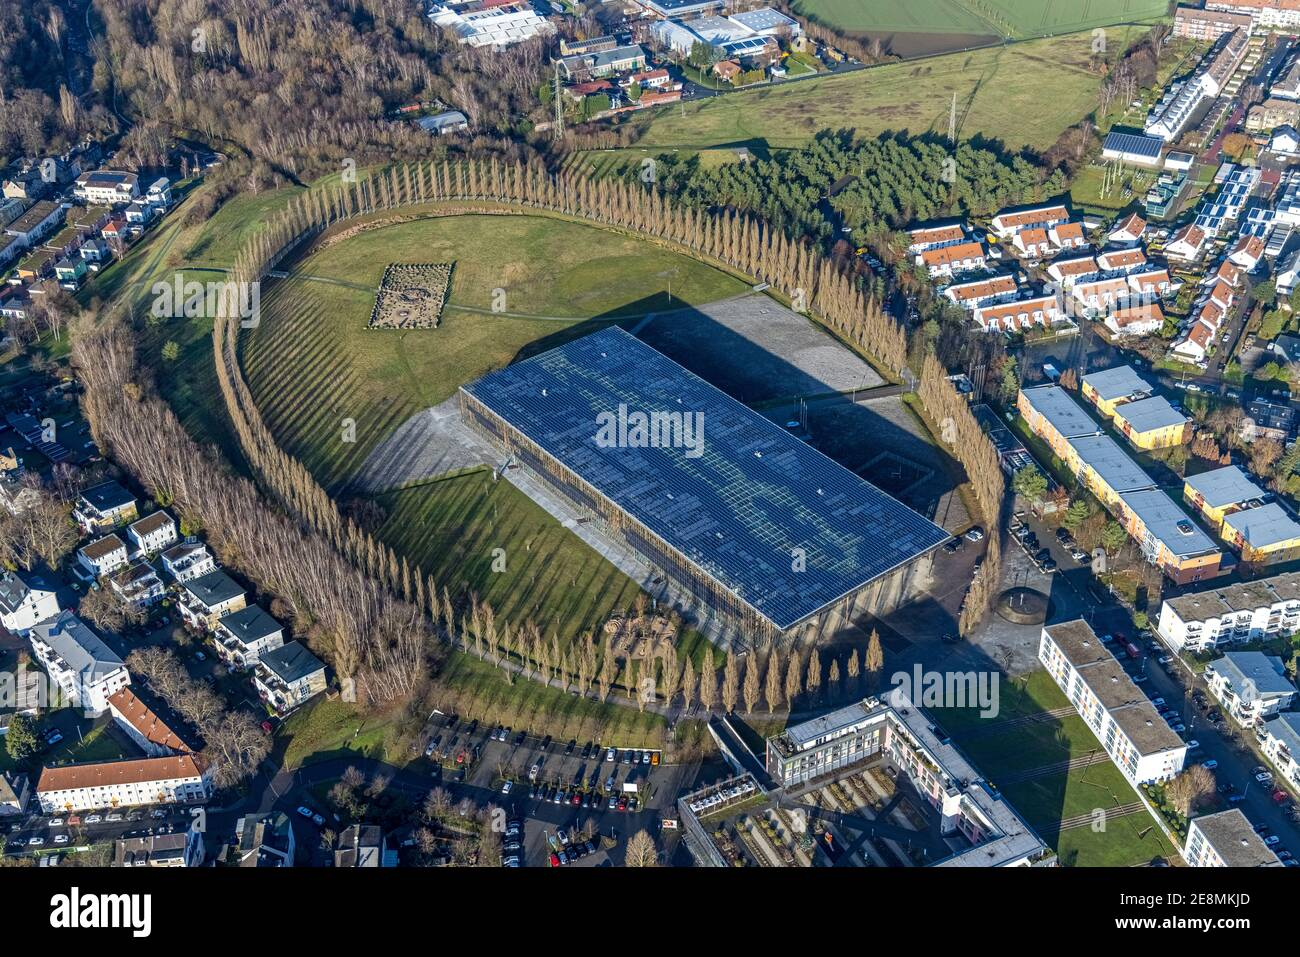 Foto aerea, tree avenue Mont-Cenis collery, Mont-Cenis Academy, Sodingen, Herne, Ruhr area, Nord Reno-Westfalia, Germania, tree circle, DE, energ Foto Stock